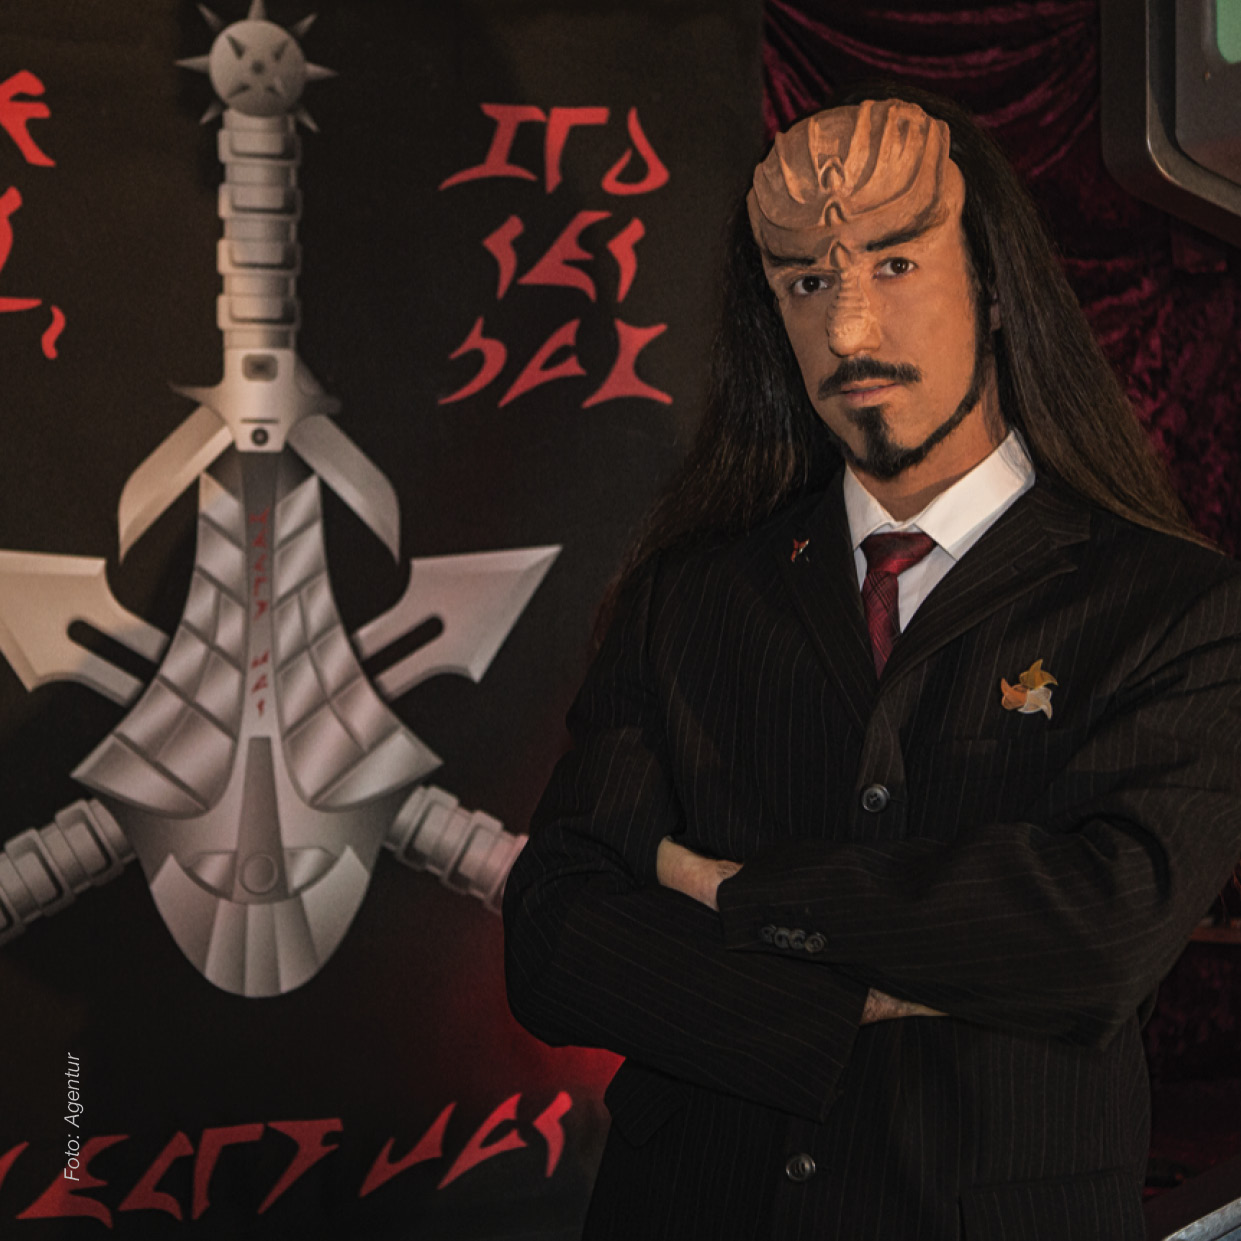 "27.06.21 Lieven L. Litaer "" Qapla'! "" - Klingonisch"